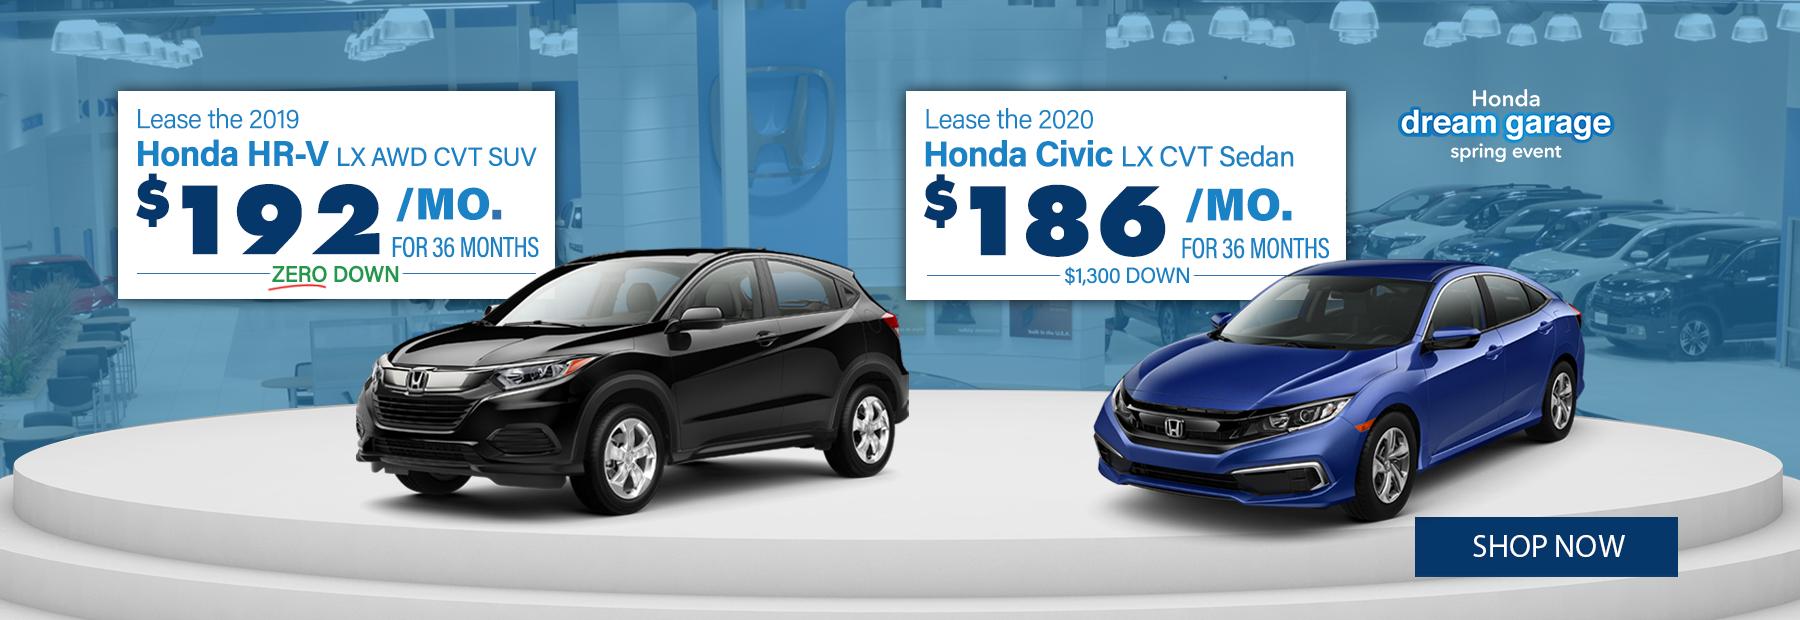 New 2020 Honda Civic and Honda HR-V Lease Deals in Cincinnati, OH